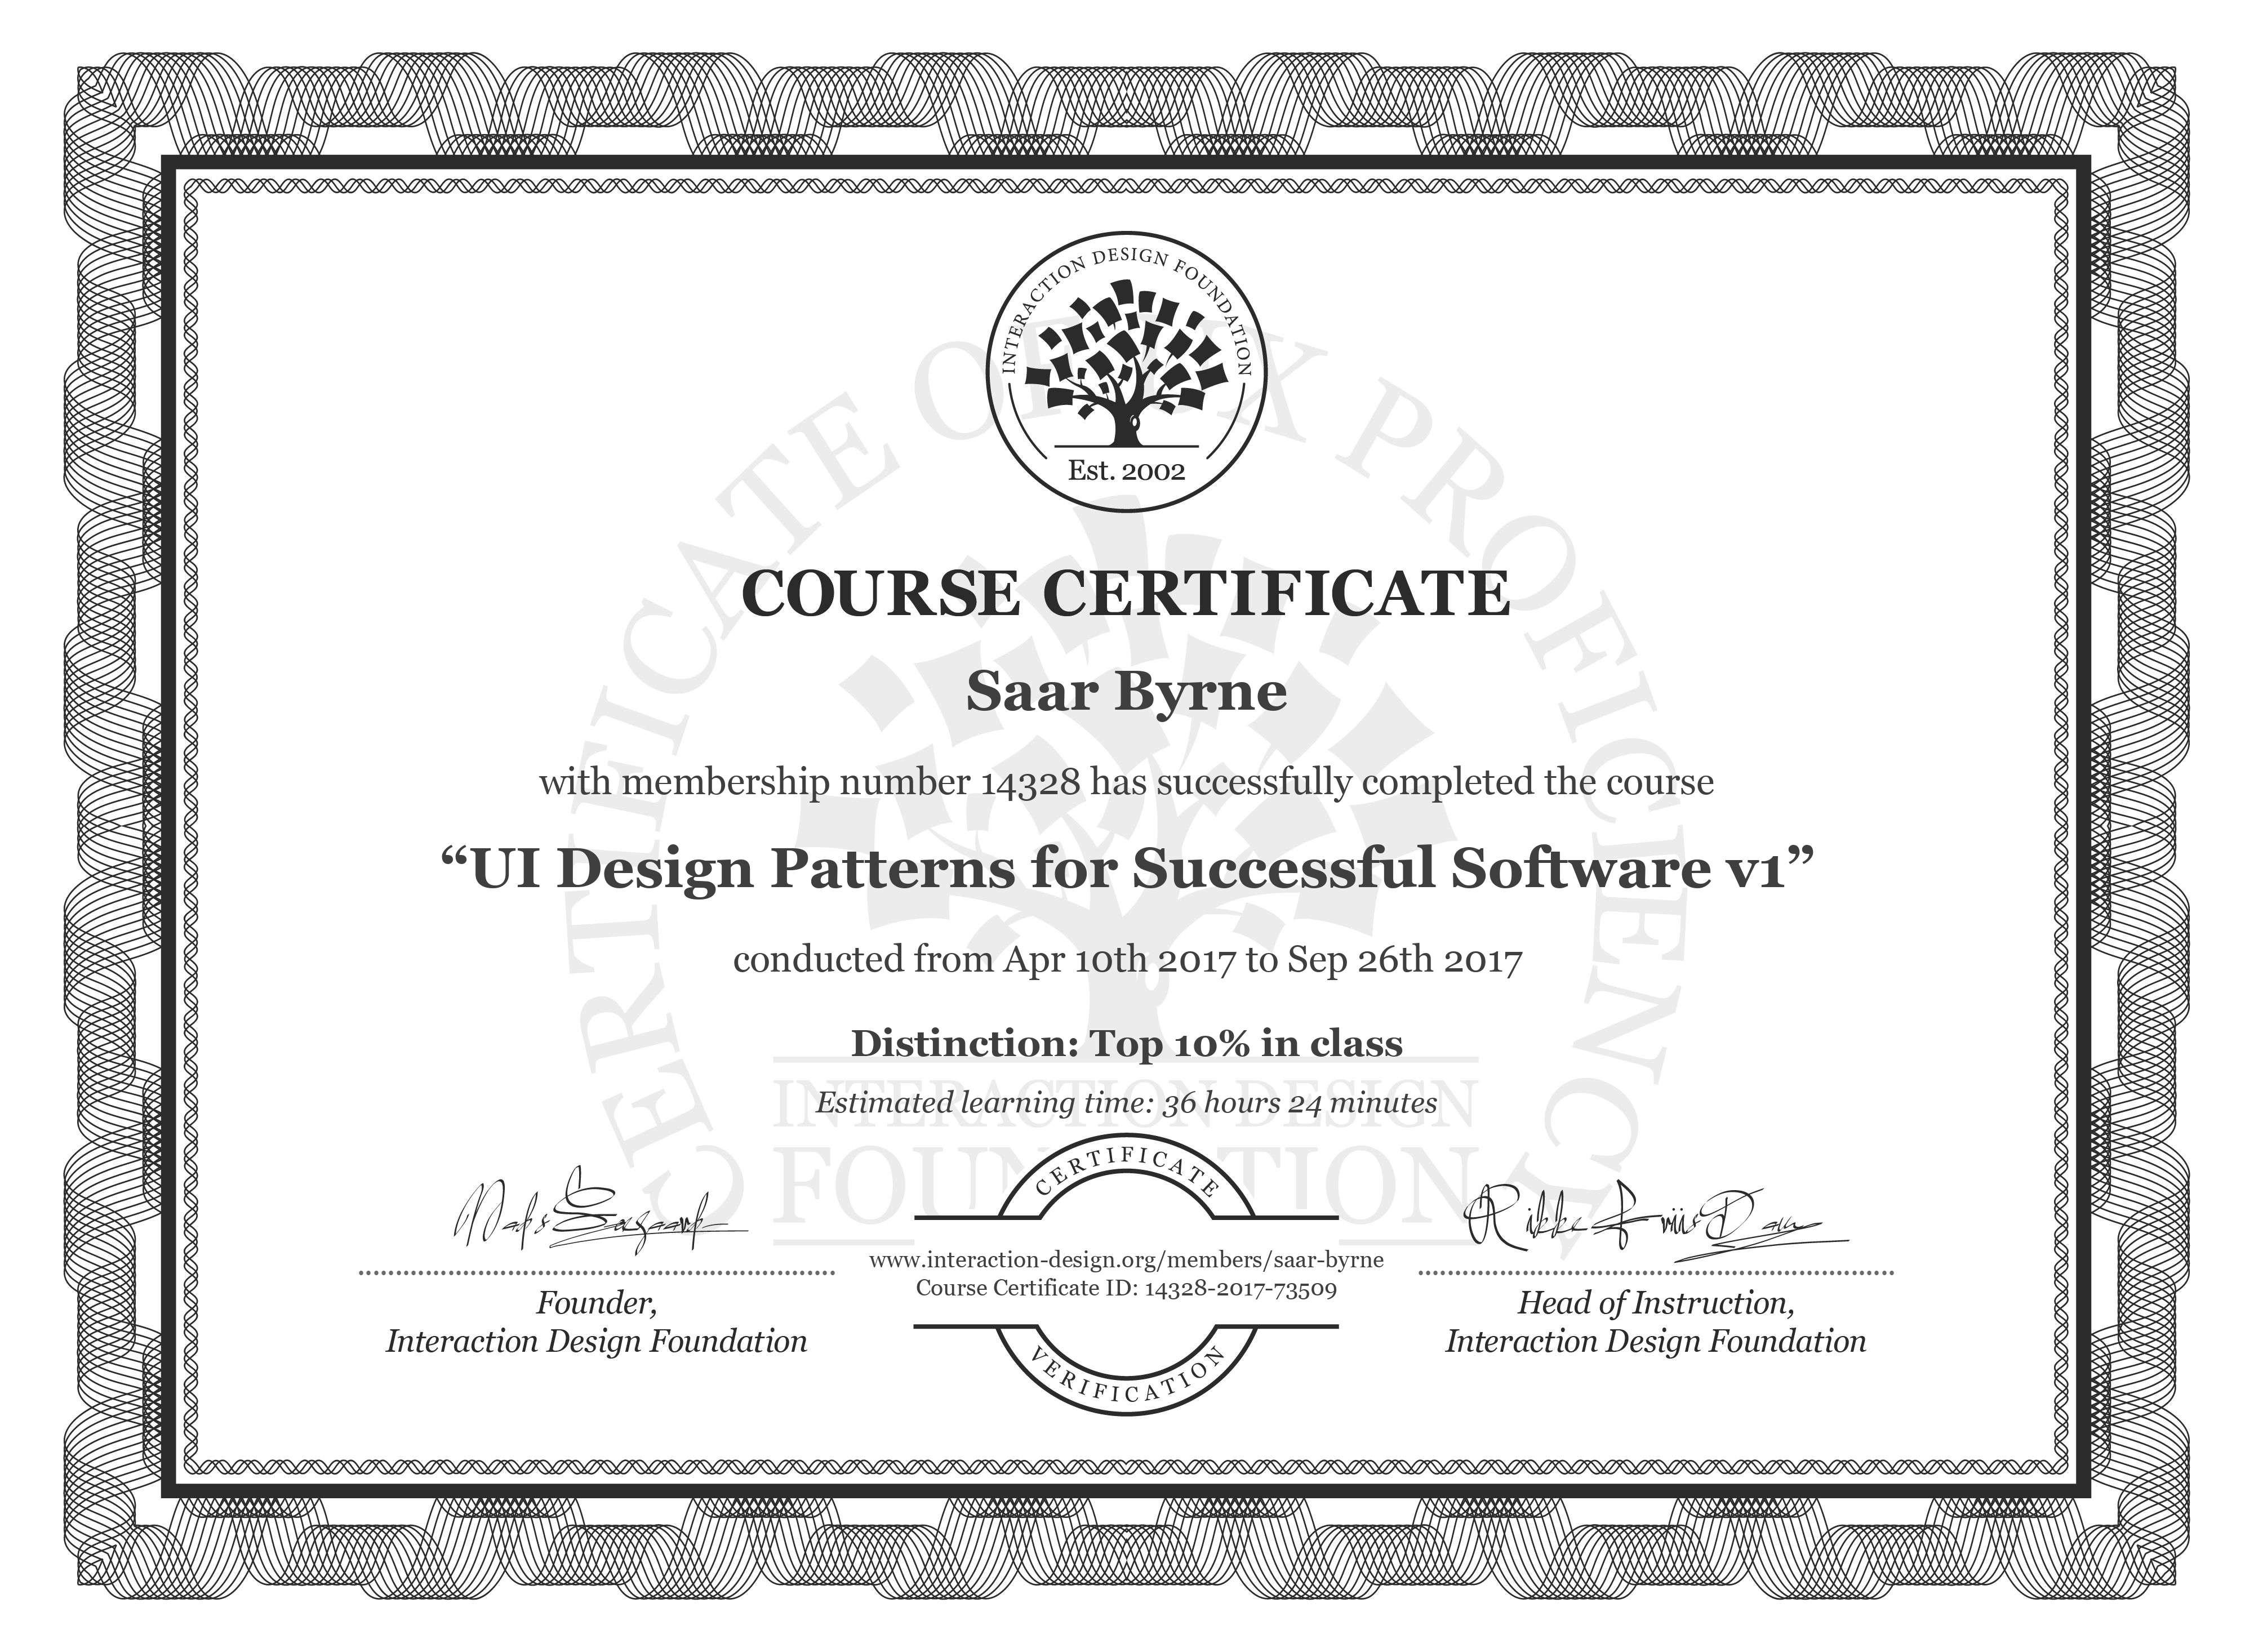 Saar Byrne's Course Certificate: UI Design Patterns for Successful Software